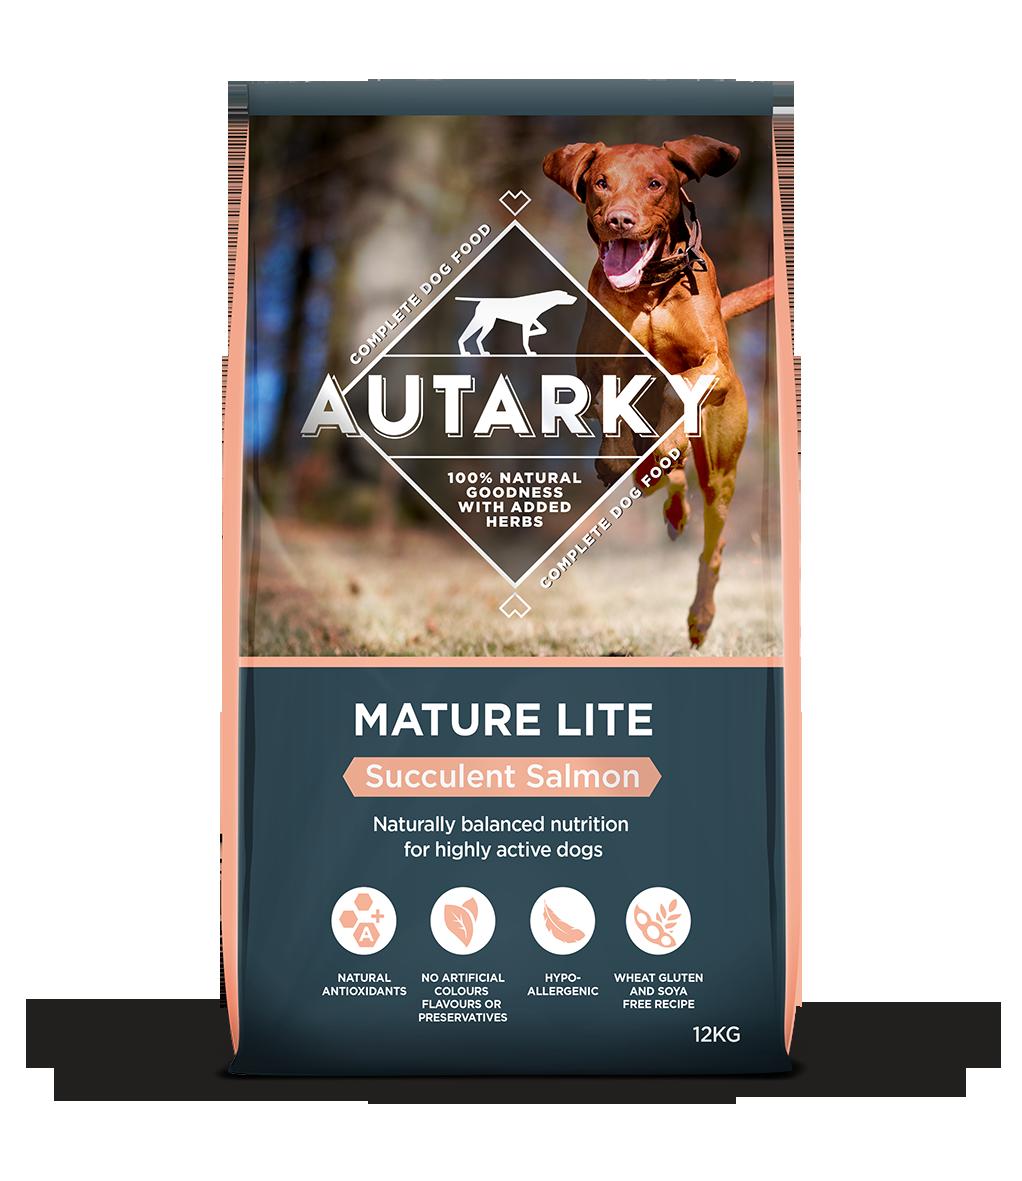 Autarky Mature Lite Salmon 12kg